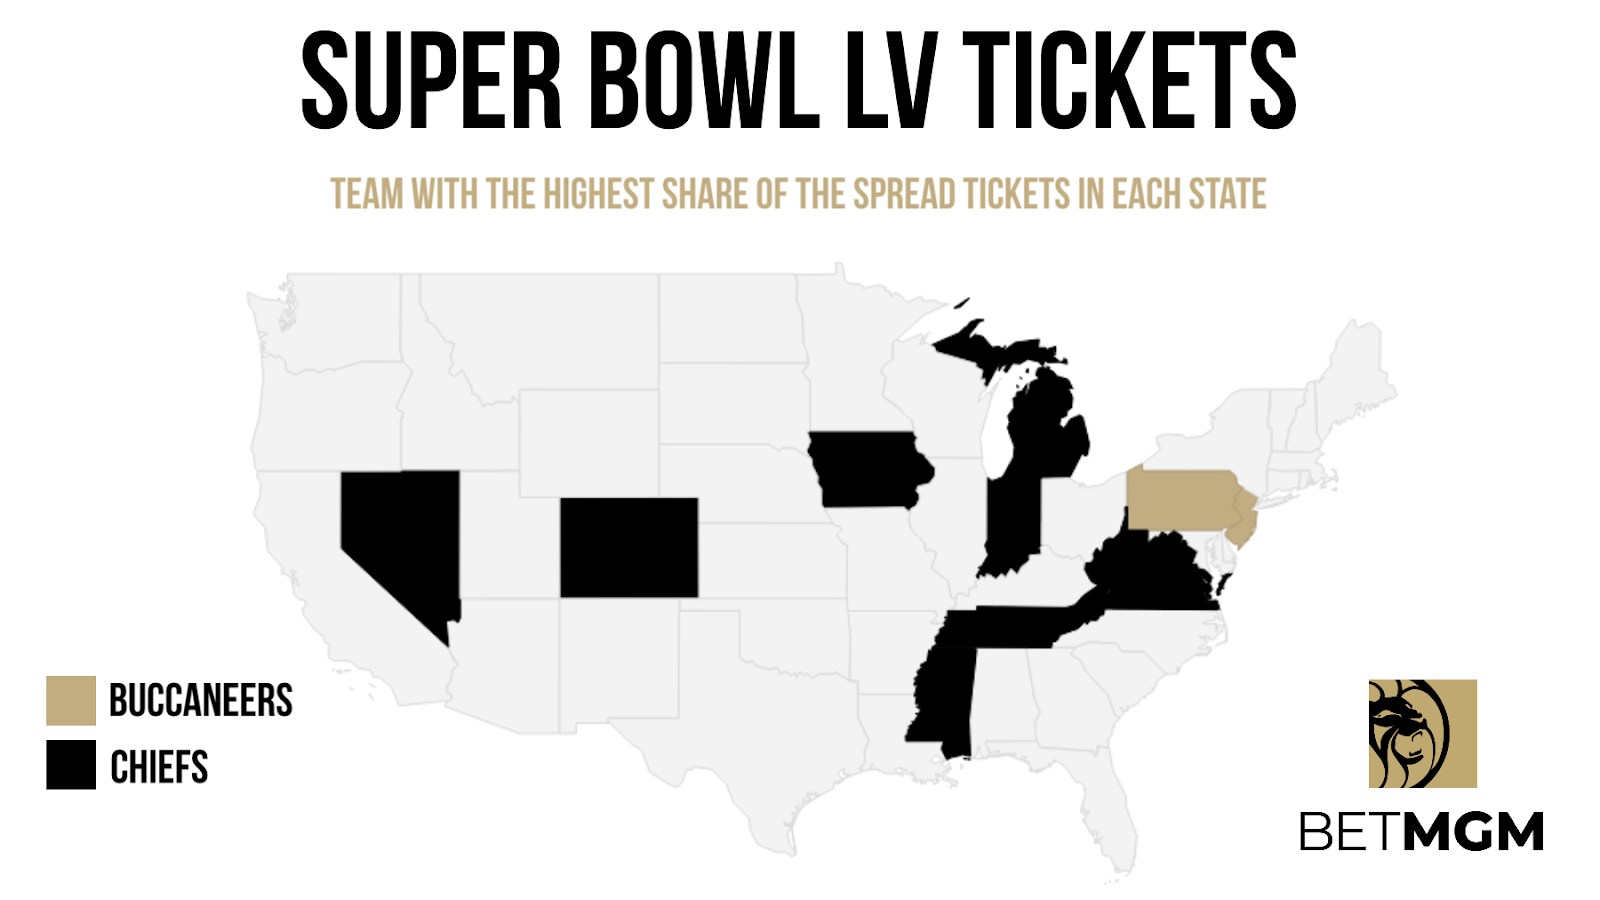 Super Bowl Betting Tickets